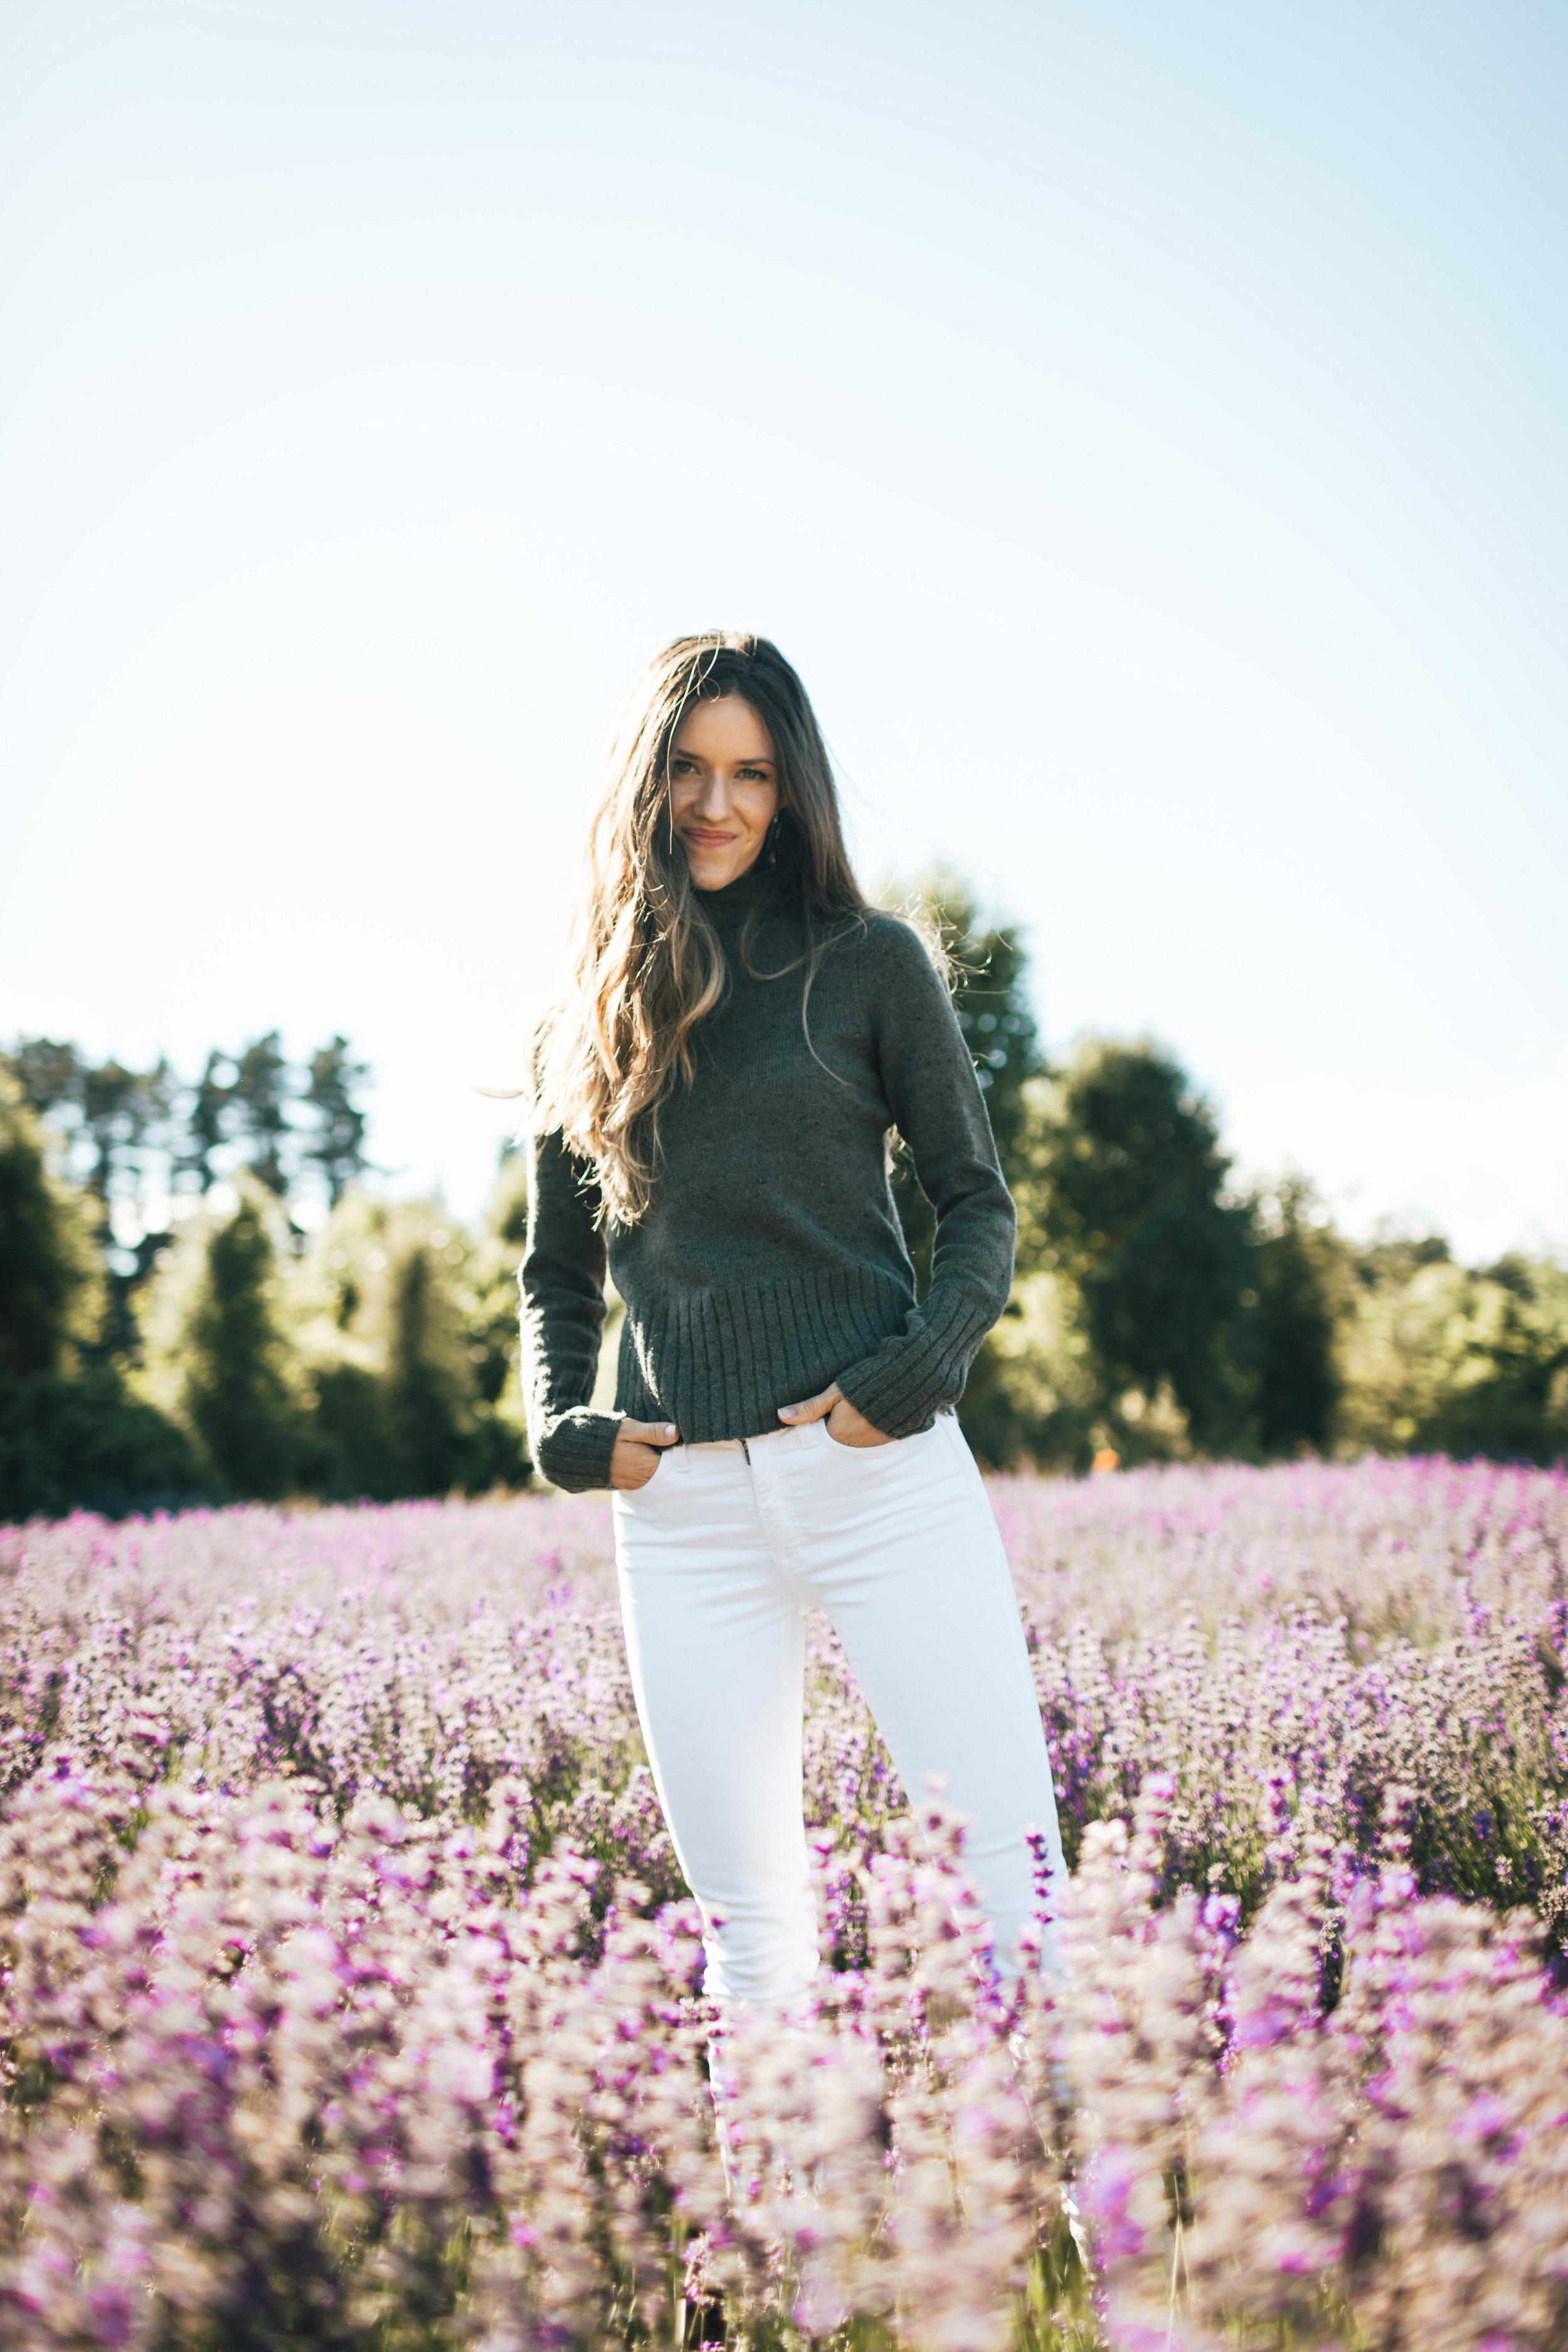 new-zealand-wanaka-lavender-farm-photo-by-samantha-look.jpg